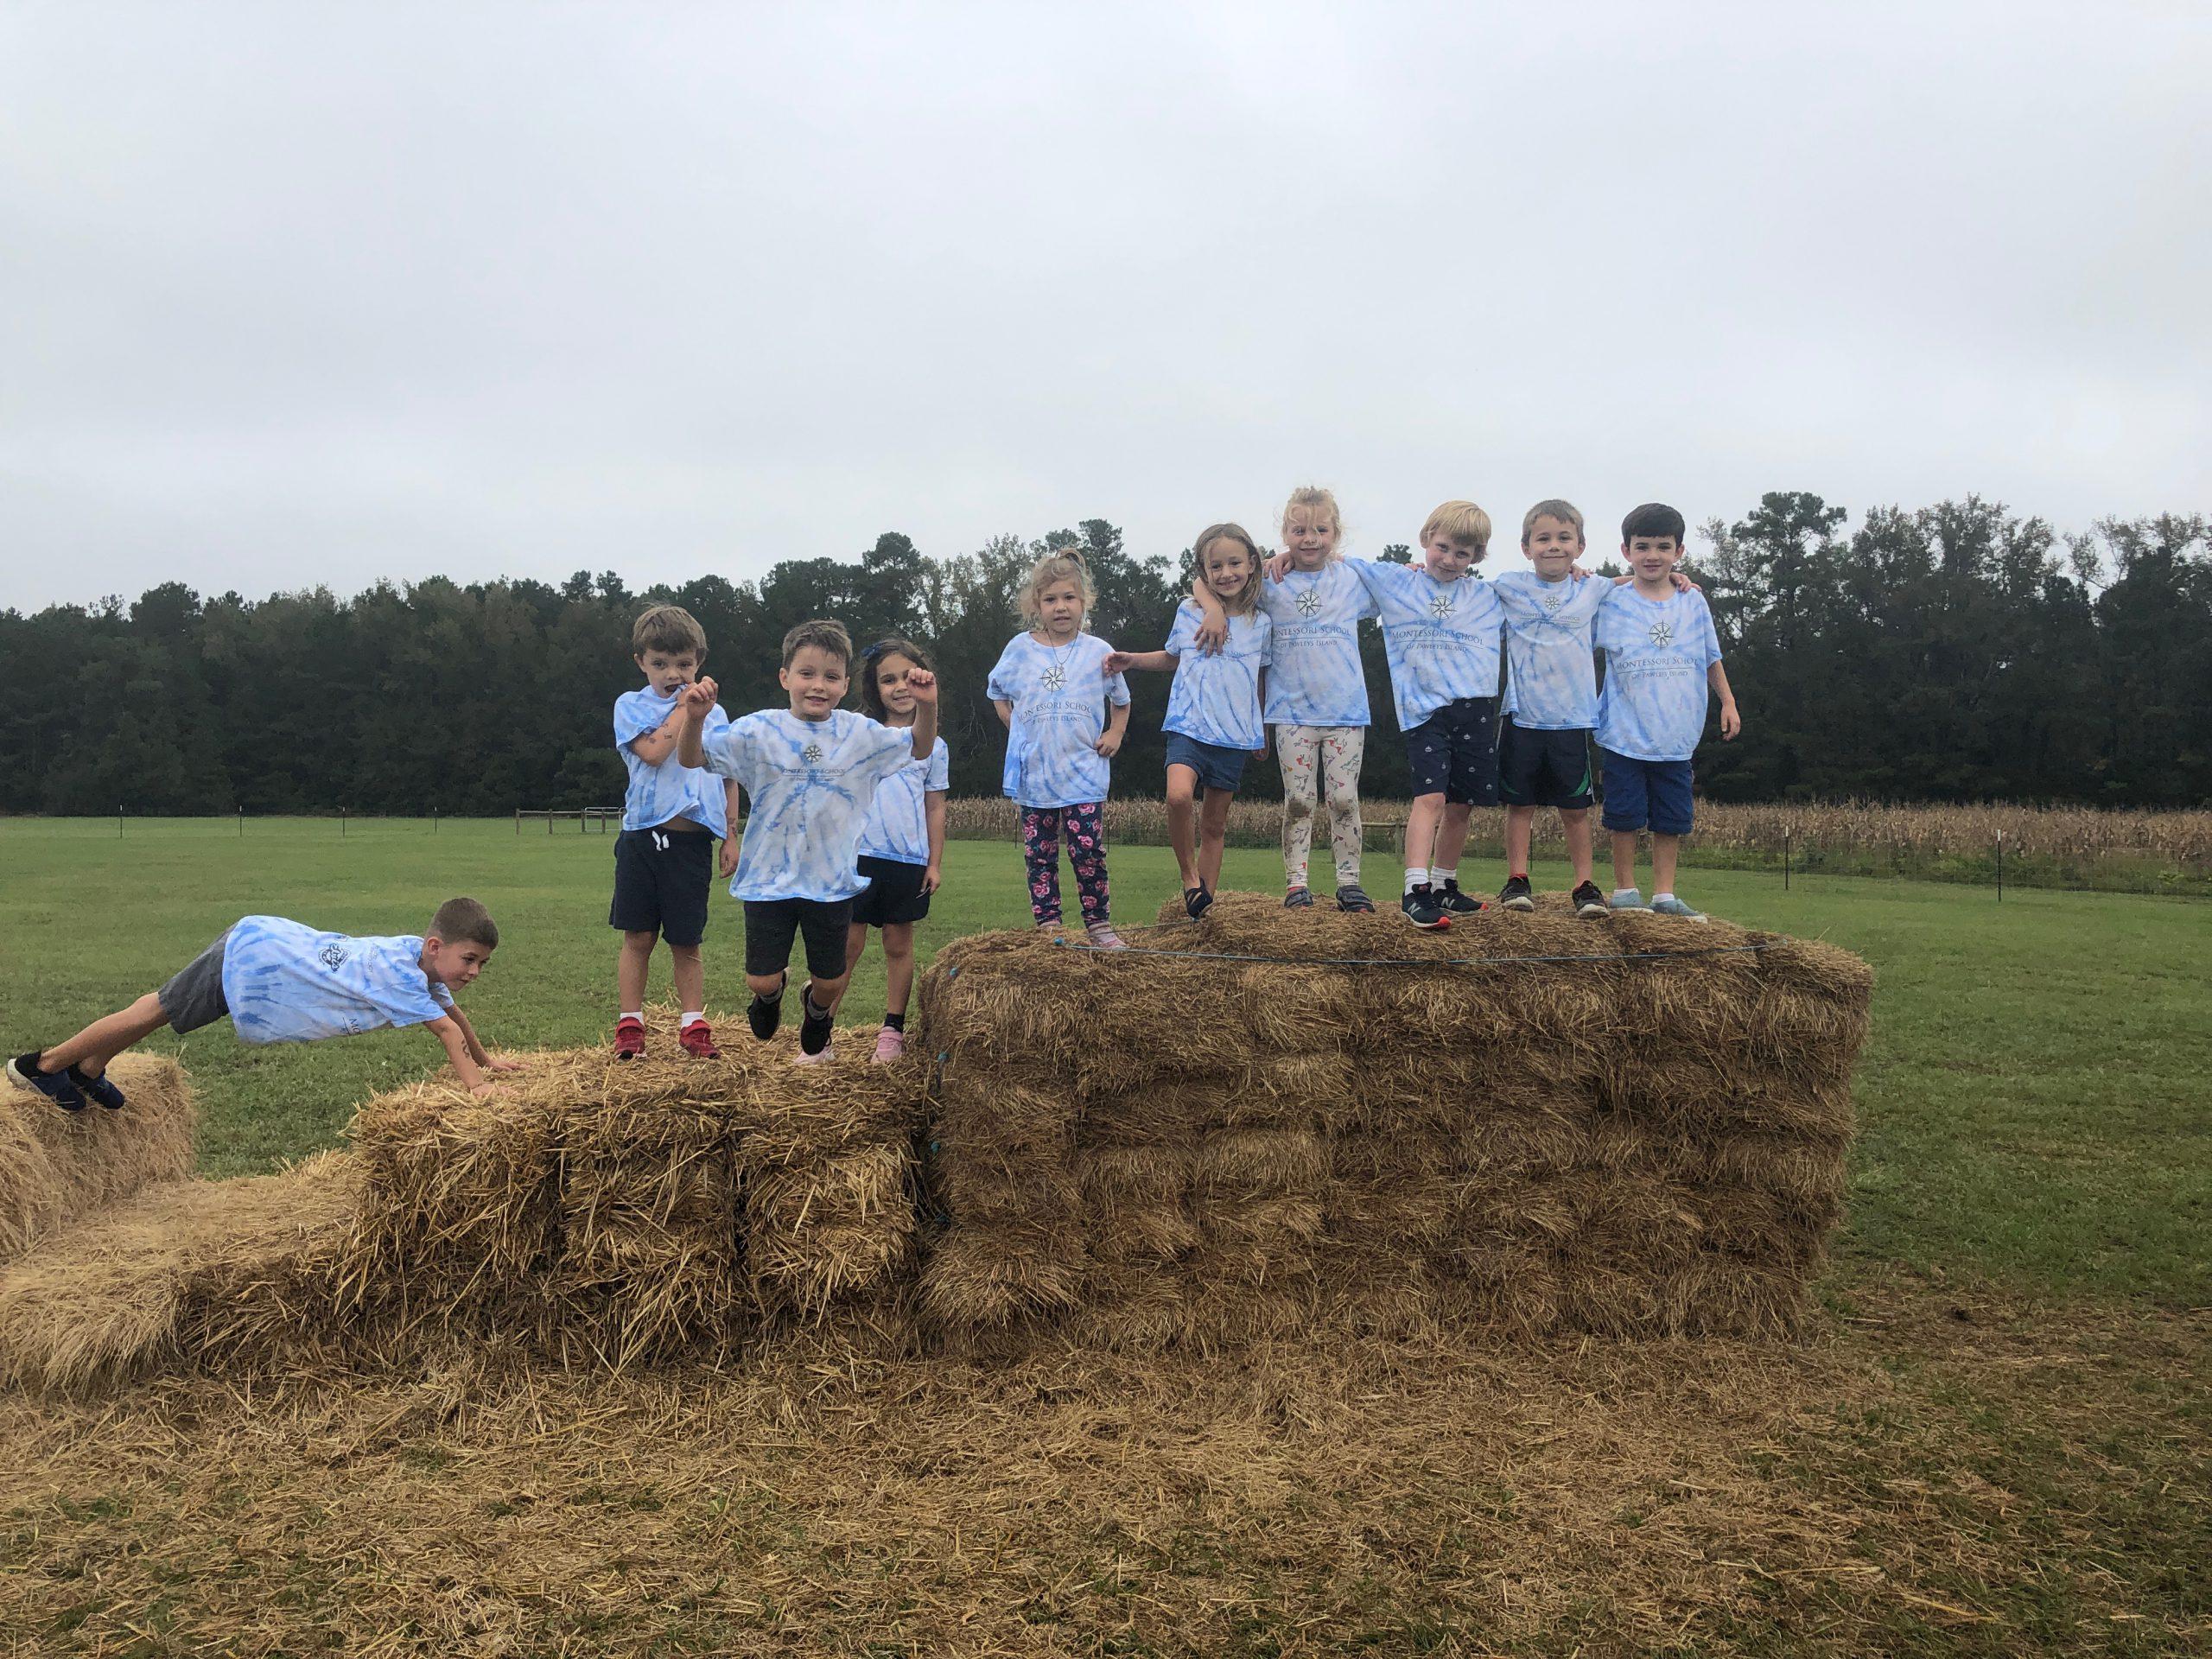 Kindergarteners enjoy a field trip to a working farm